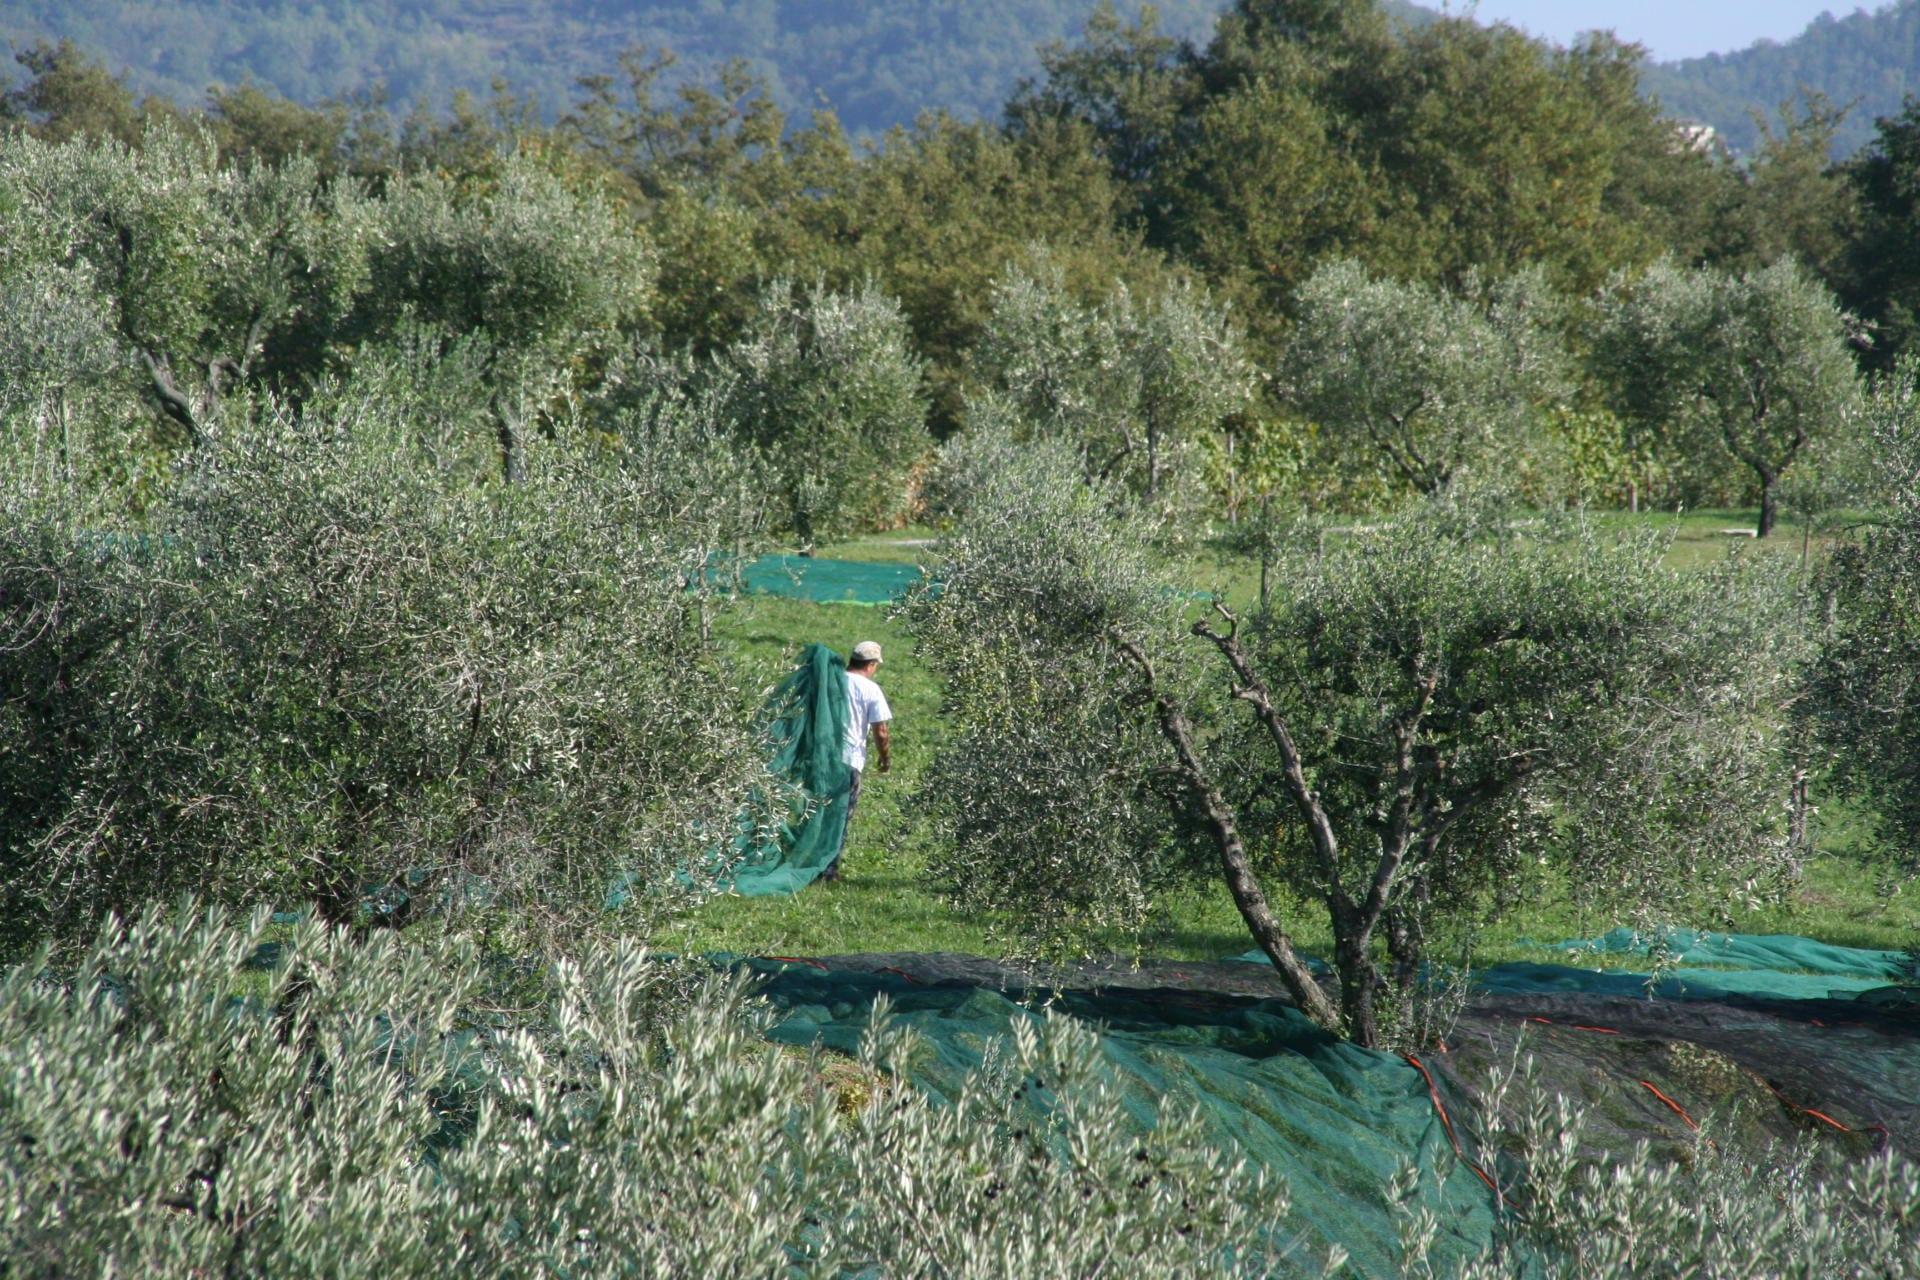 Høsting av oliven - Foto: Azienda Agricola Pomario